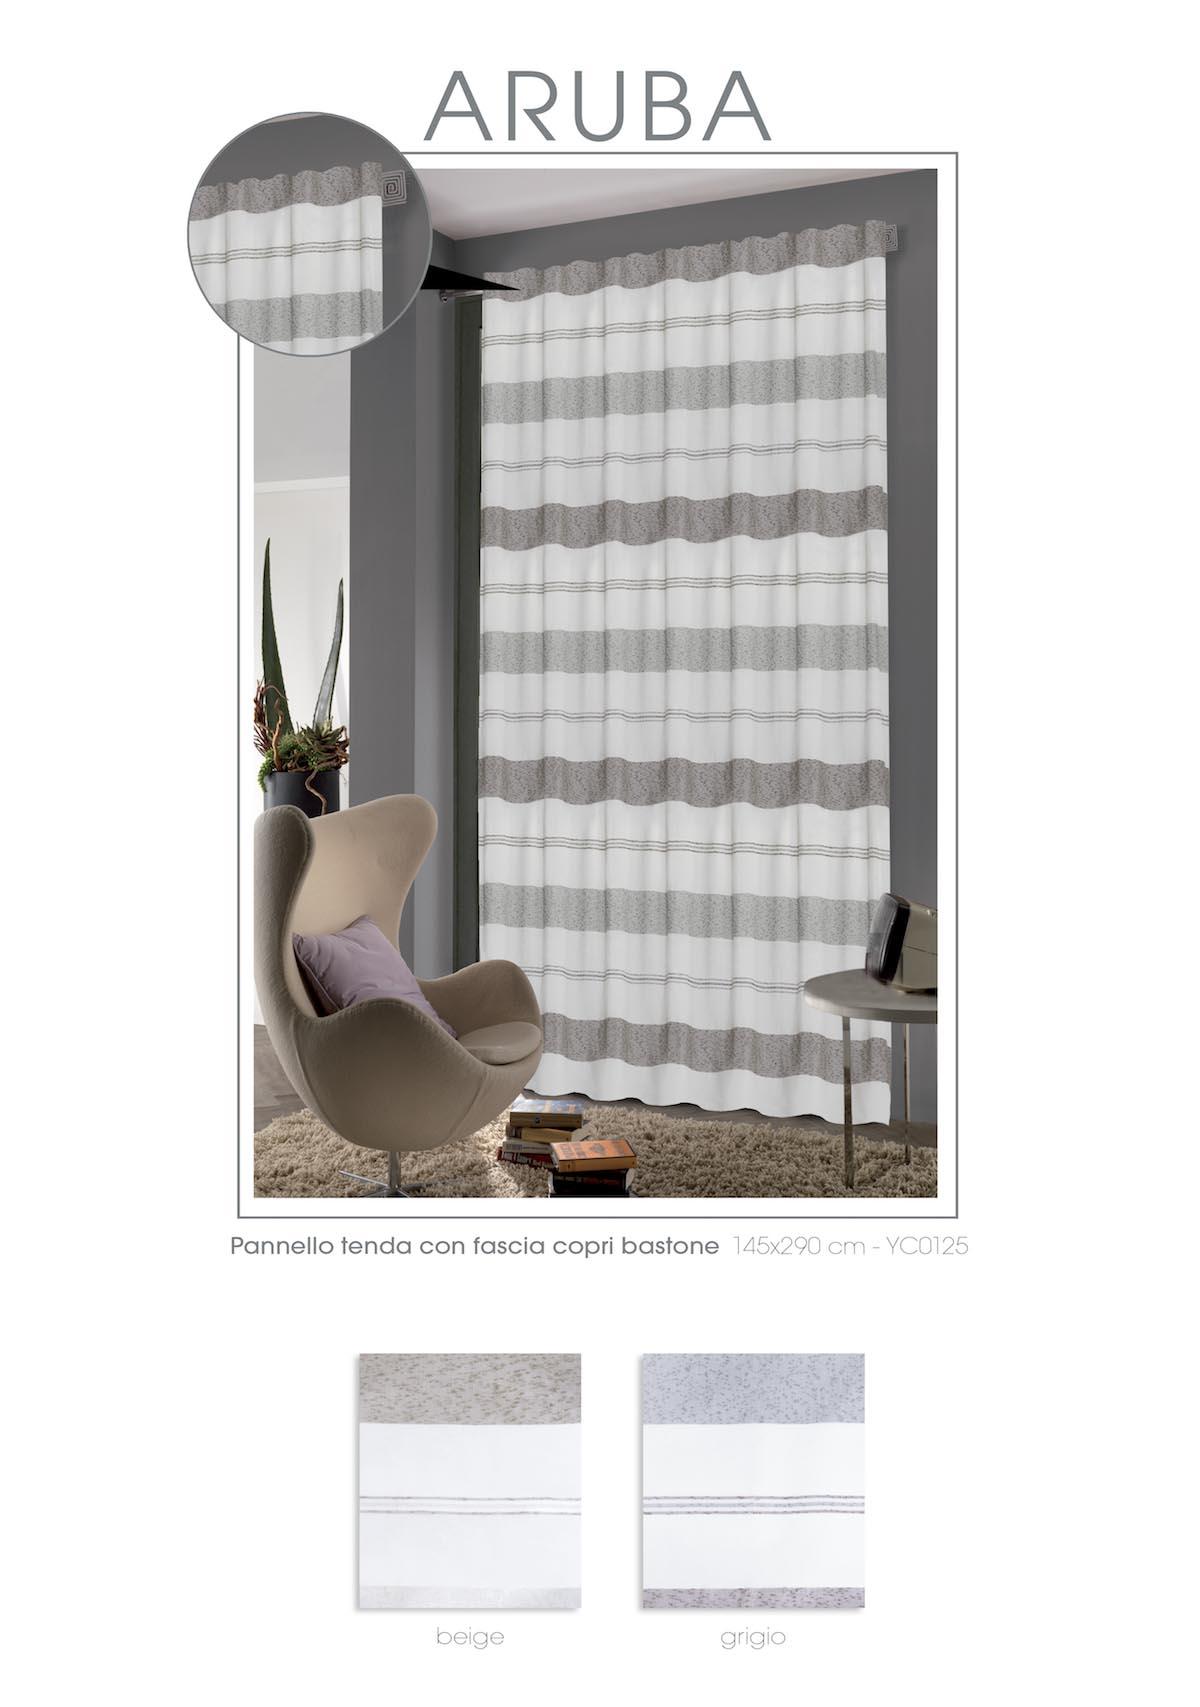 Binario tende pannello in vendita: Mae Ready Made Curtains Via Roma 60